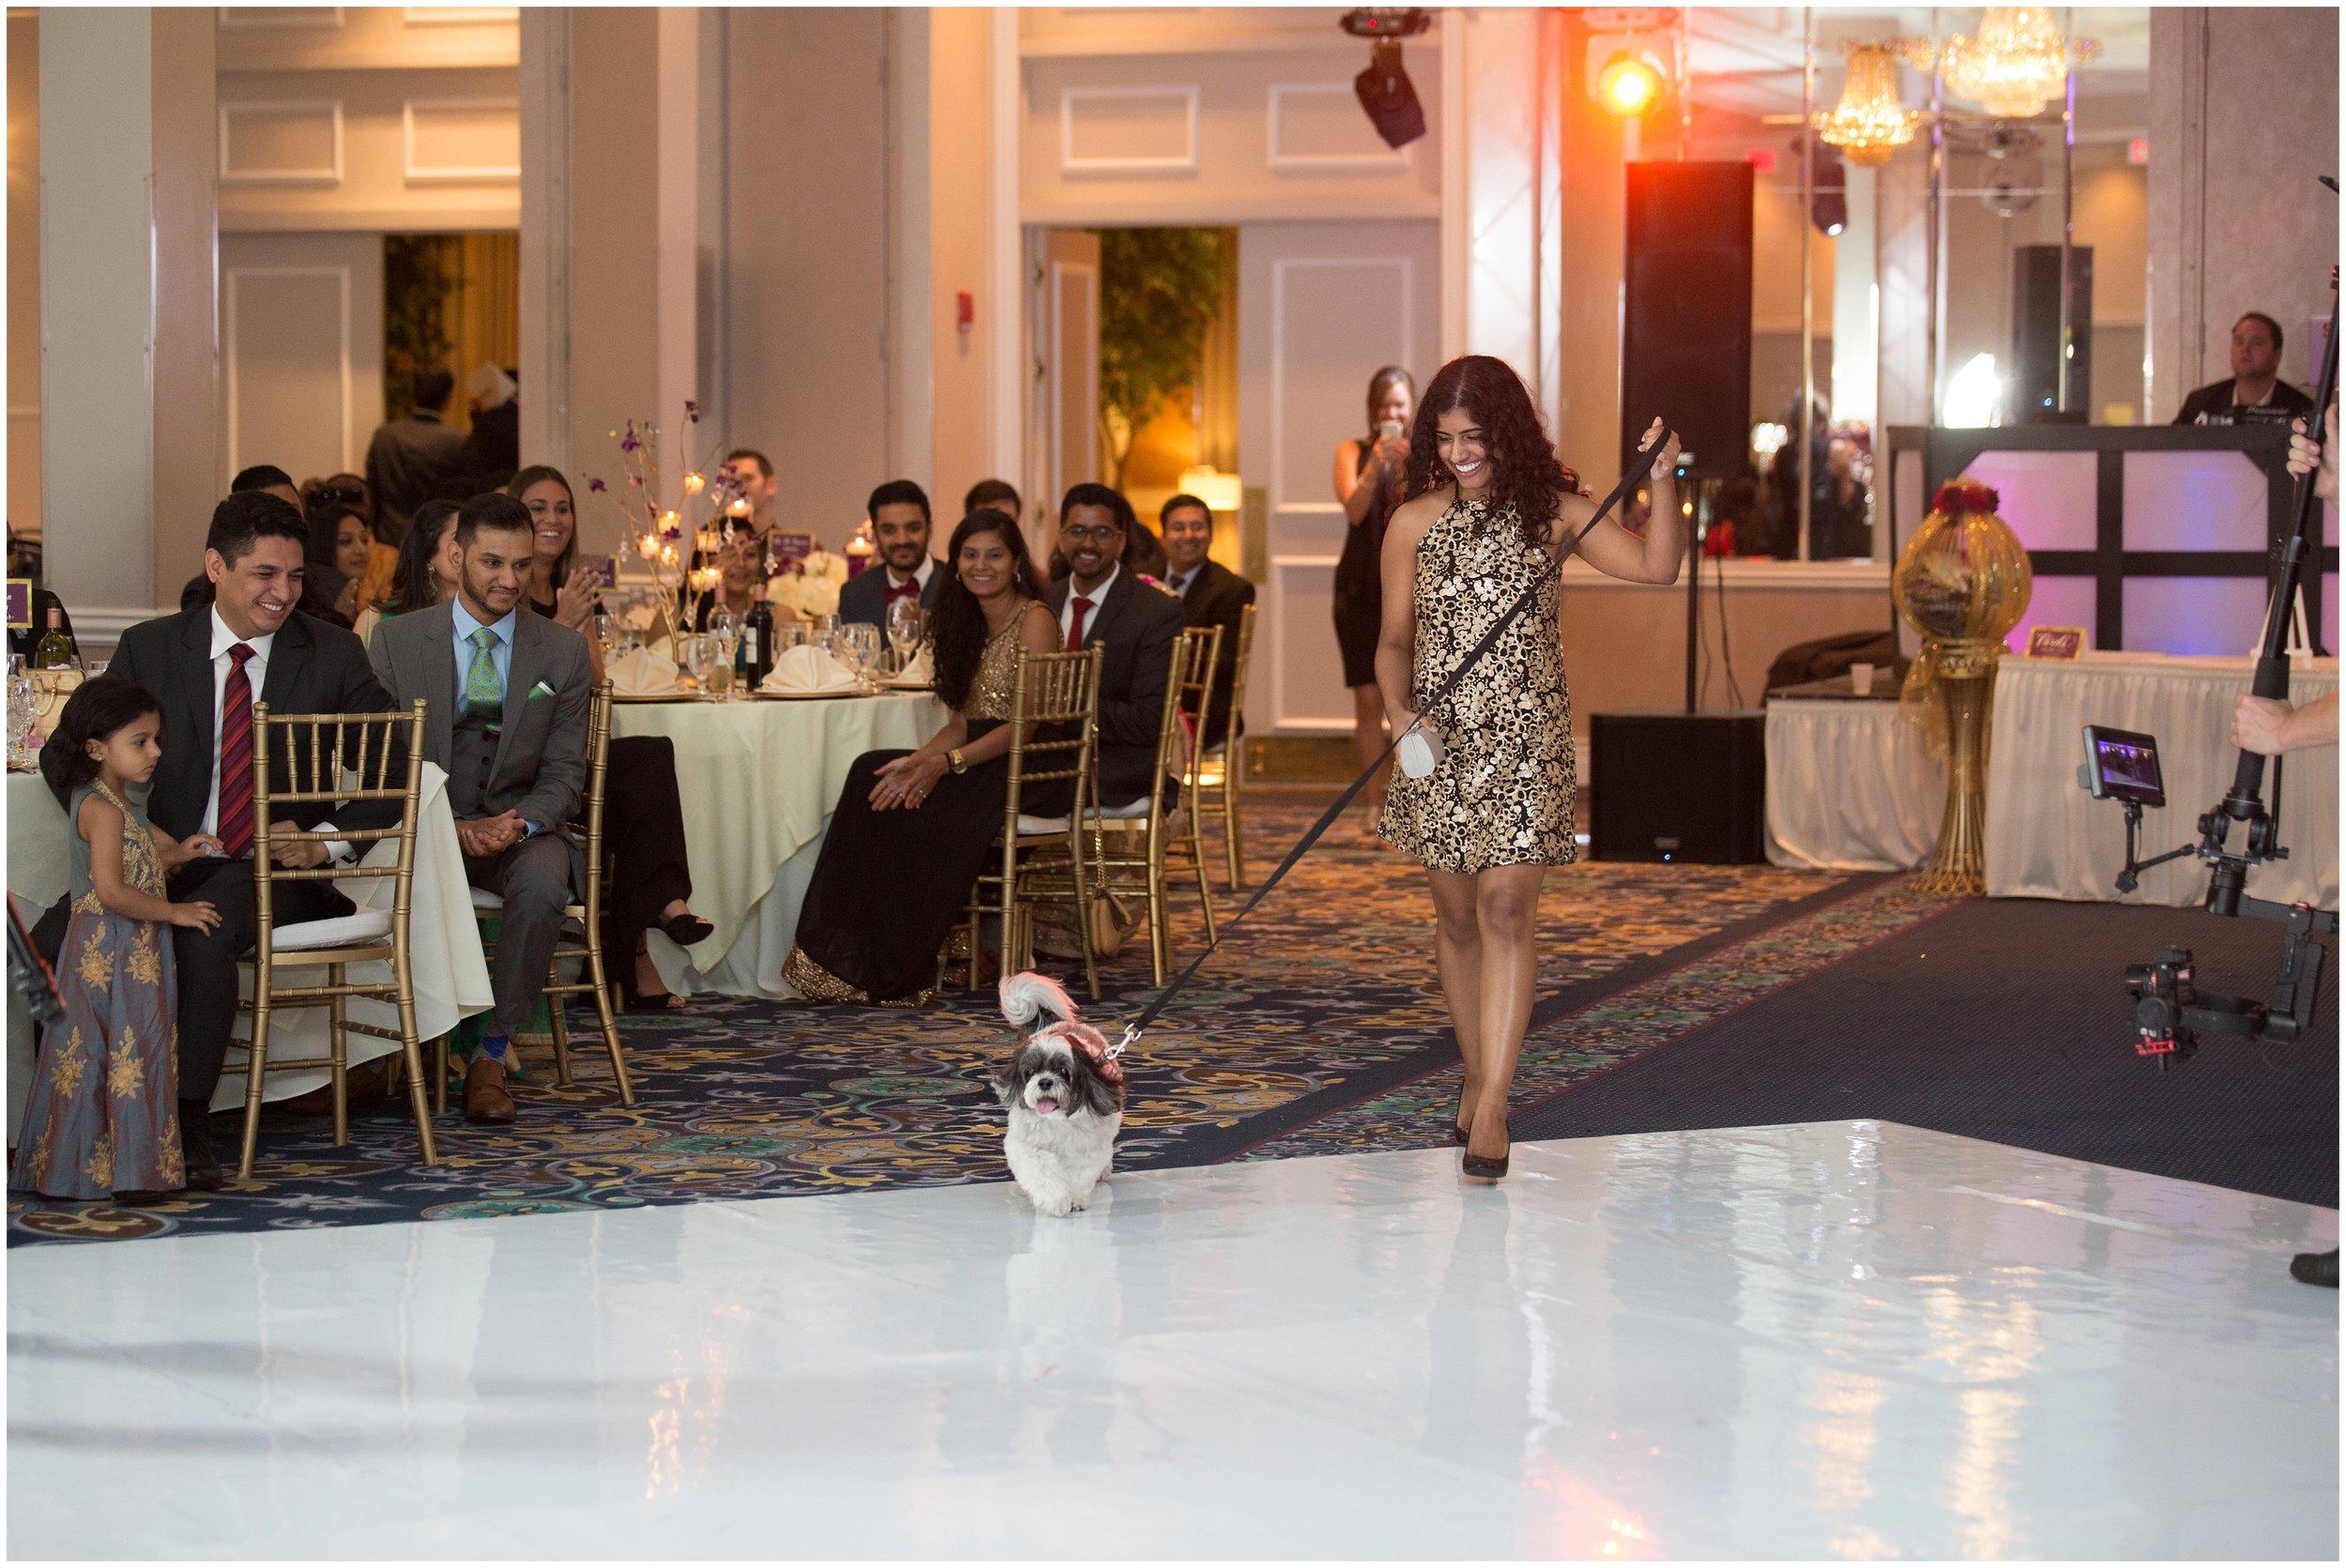 Le Cape Weddings - South Asian Wedding in Illinois - Tanvi and Anshul -2192_LuxuryDestinationPhotographer.jpg